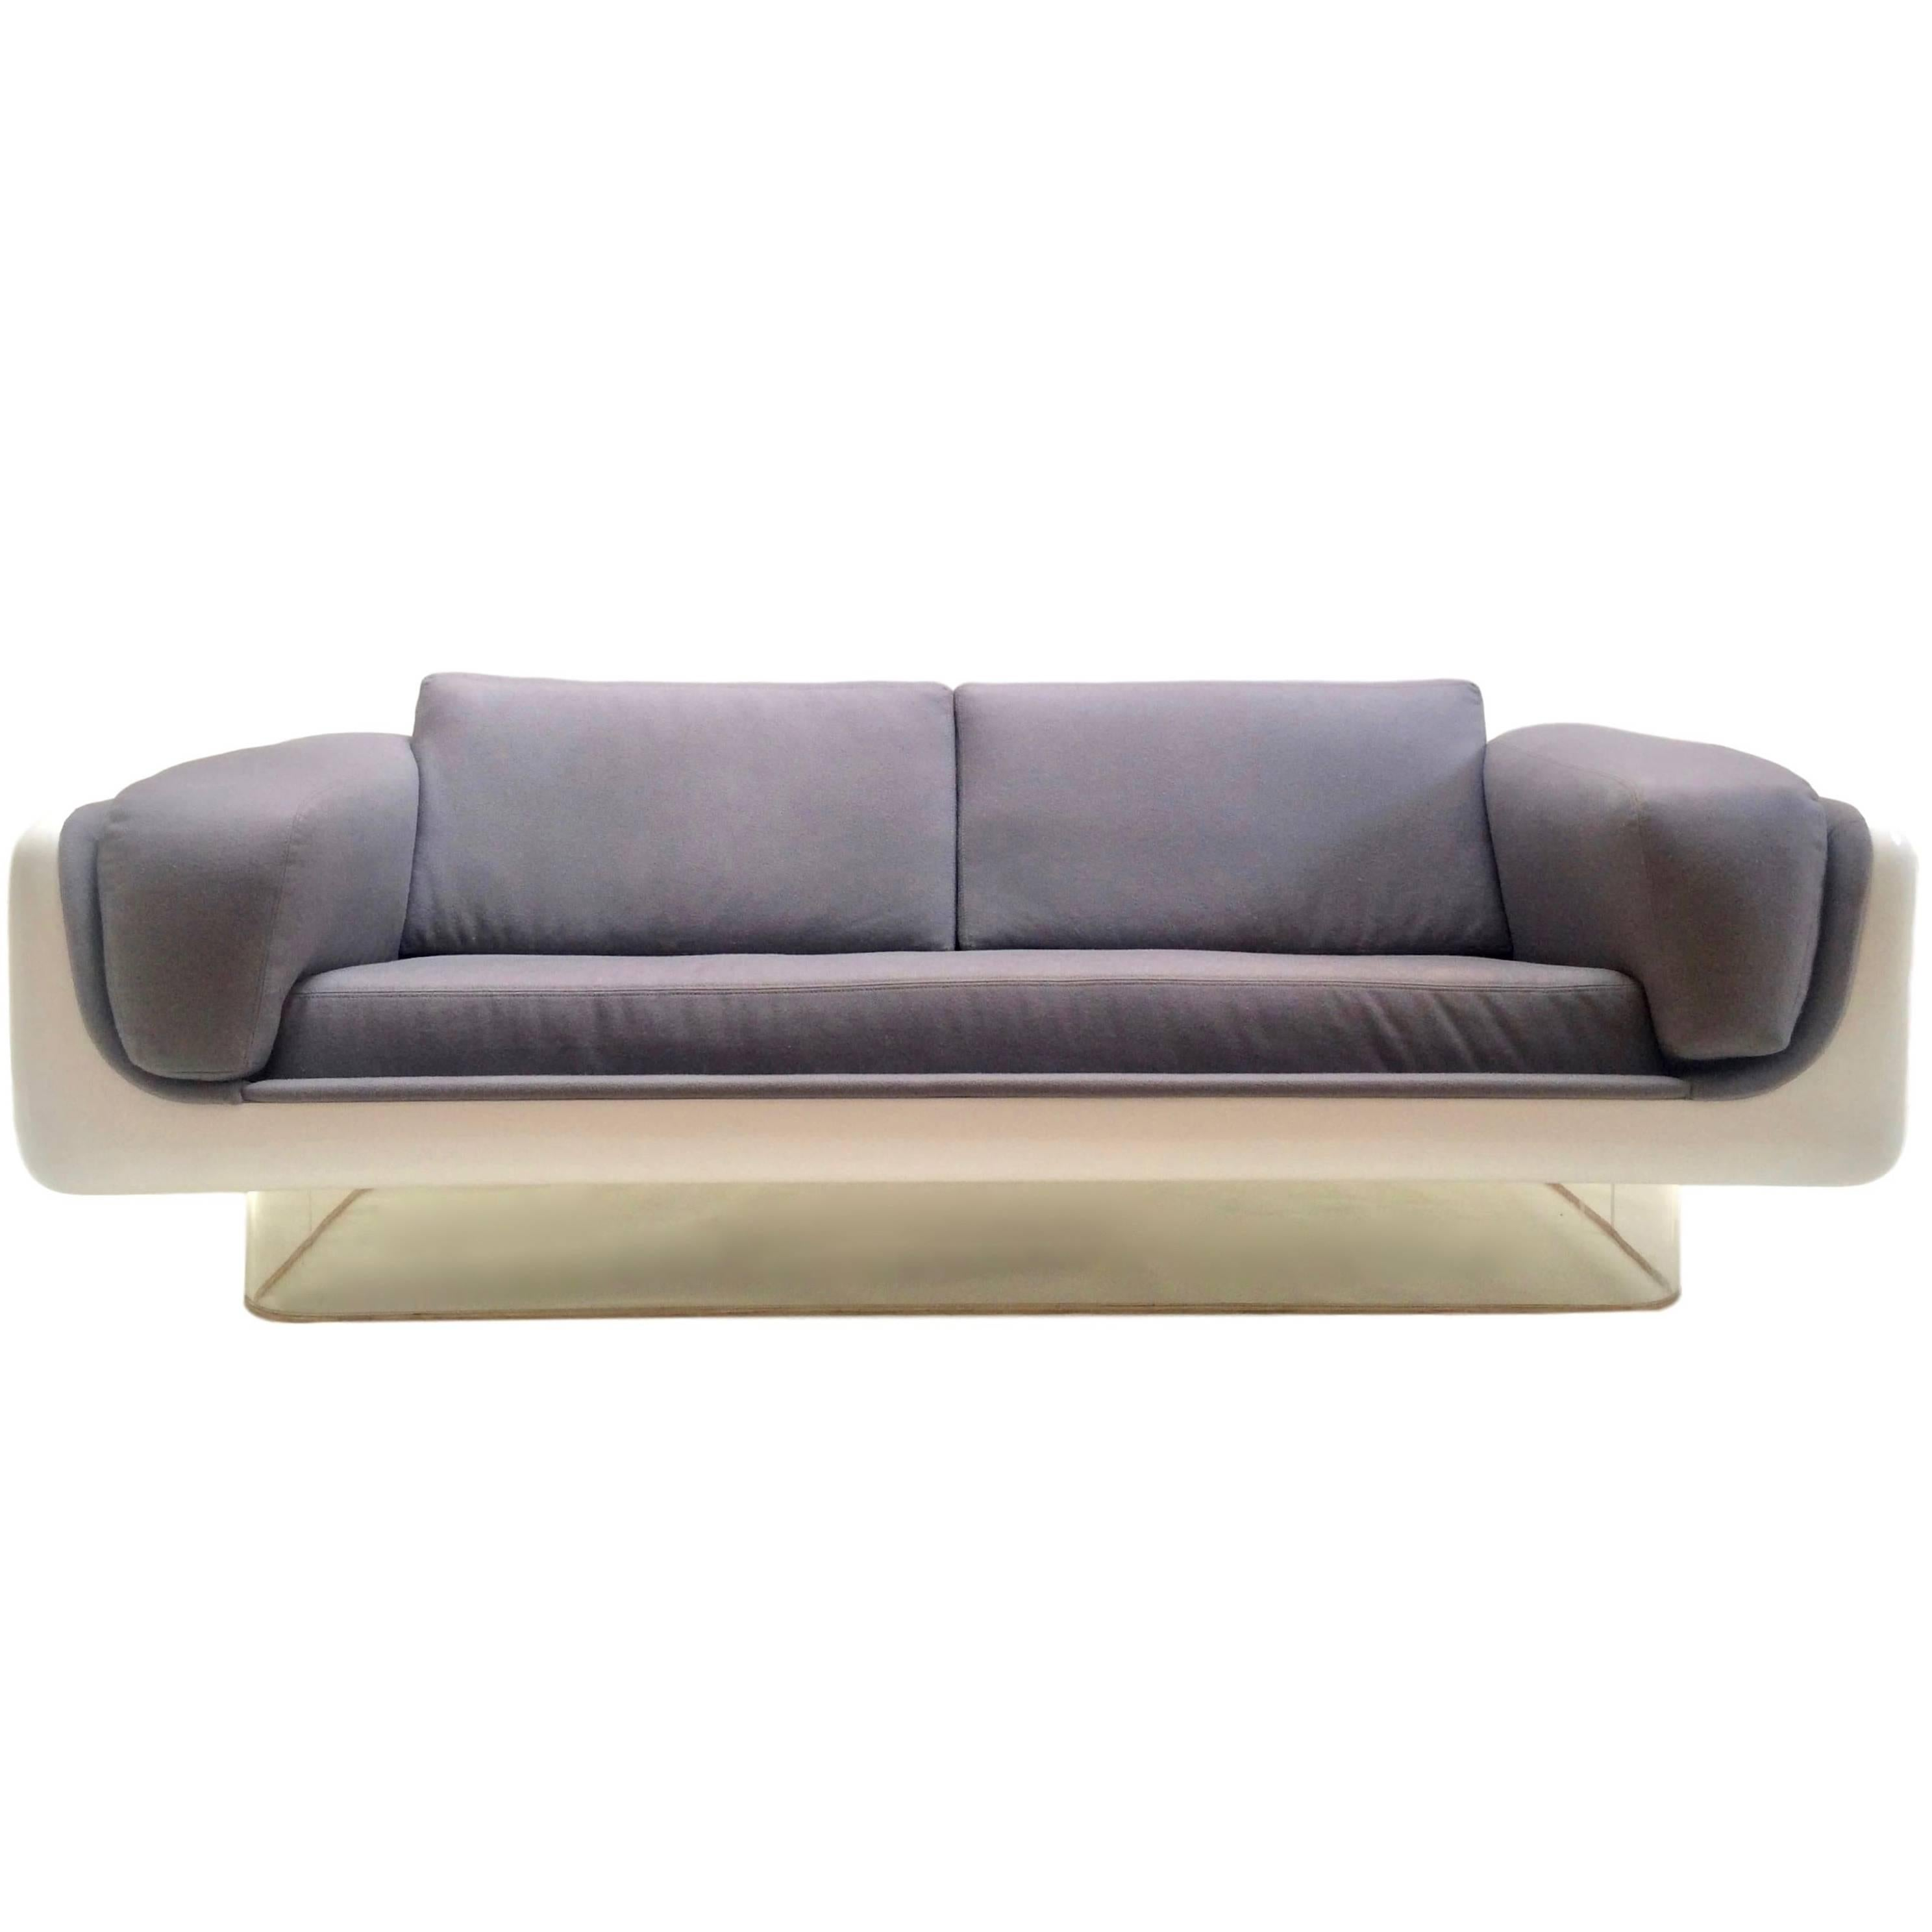 steelcase sofa platner chair bed argos mid century modern warren style fiberglass lucite and by